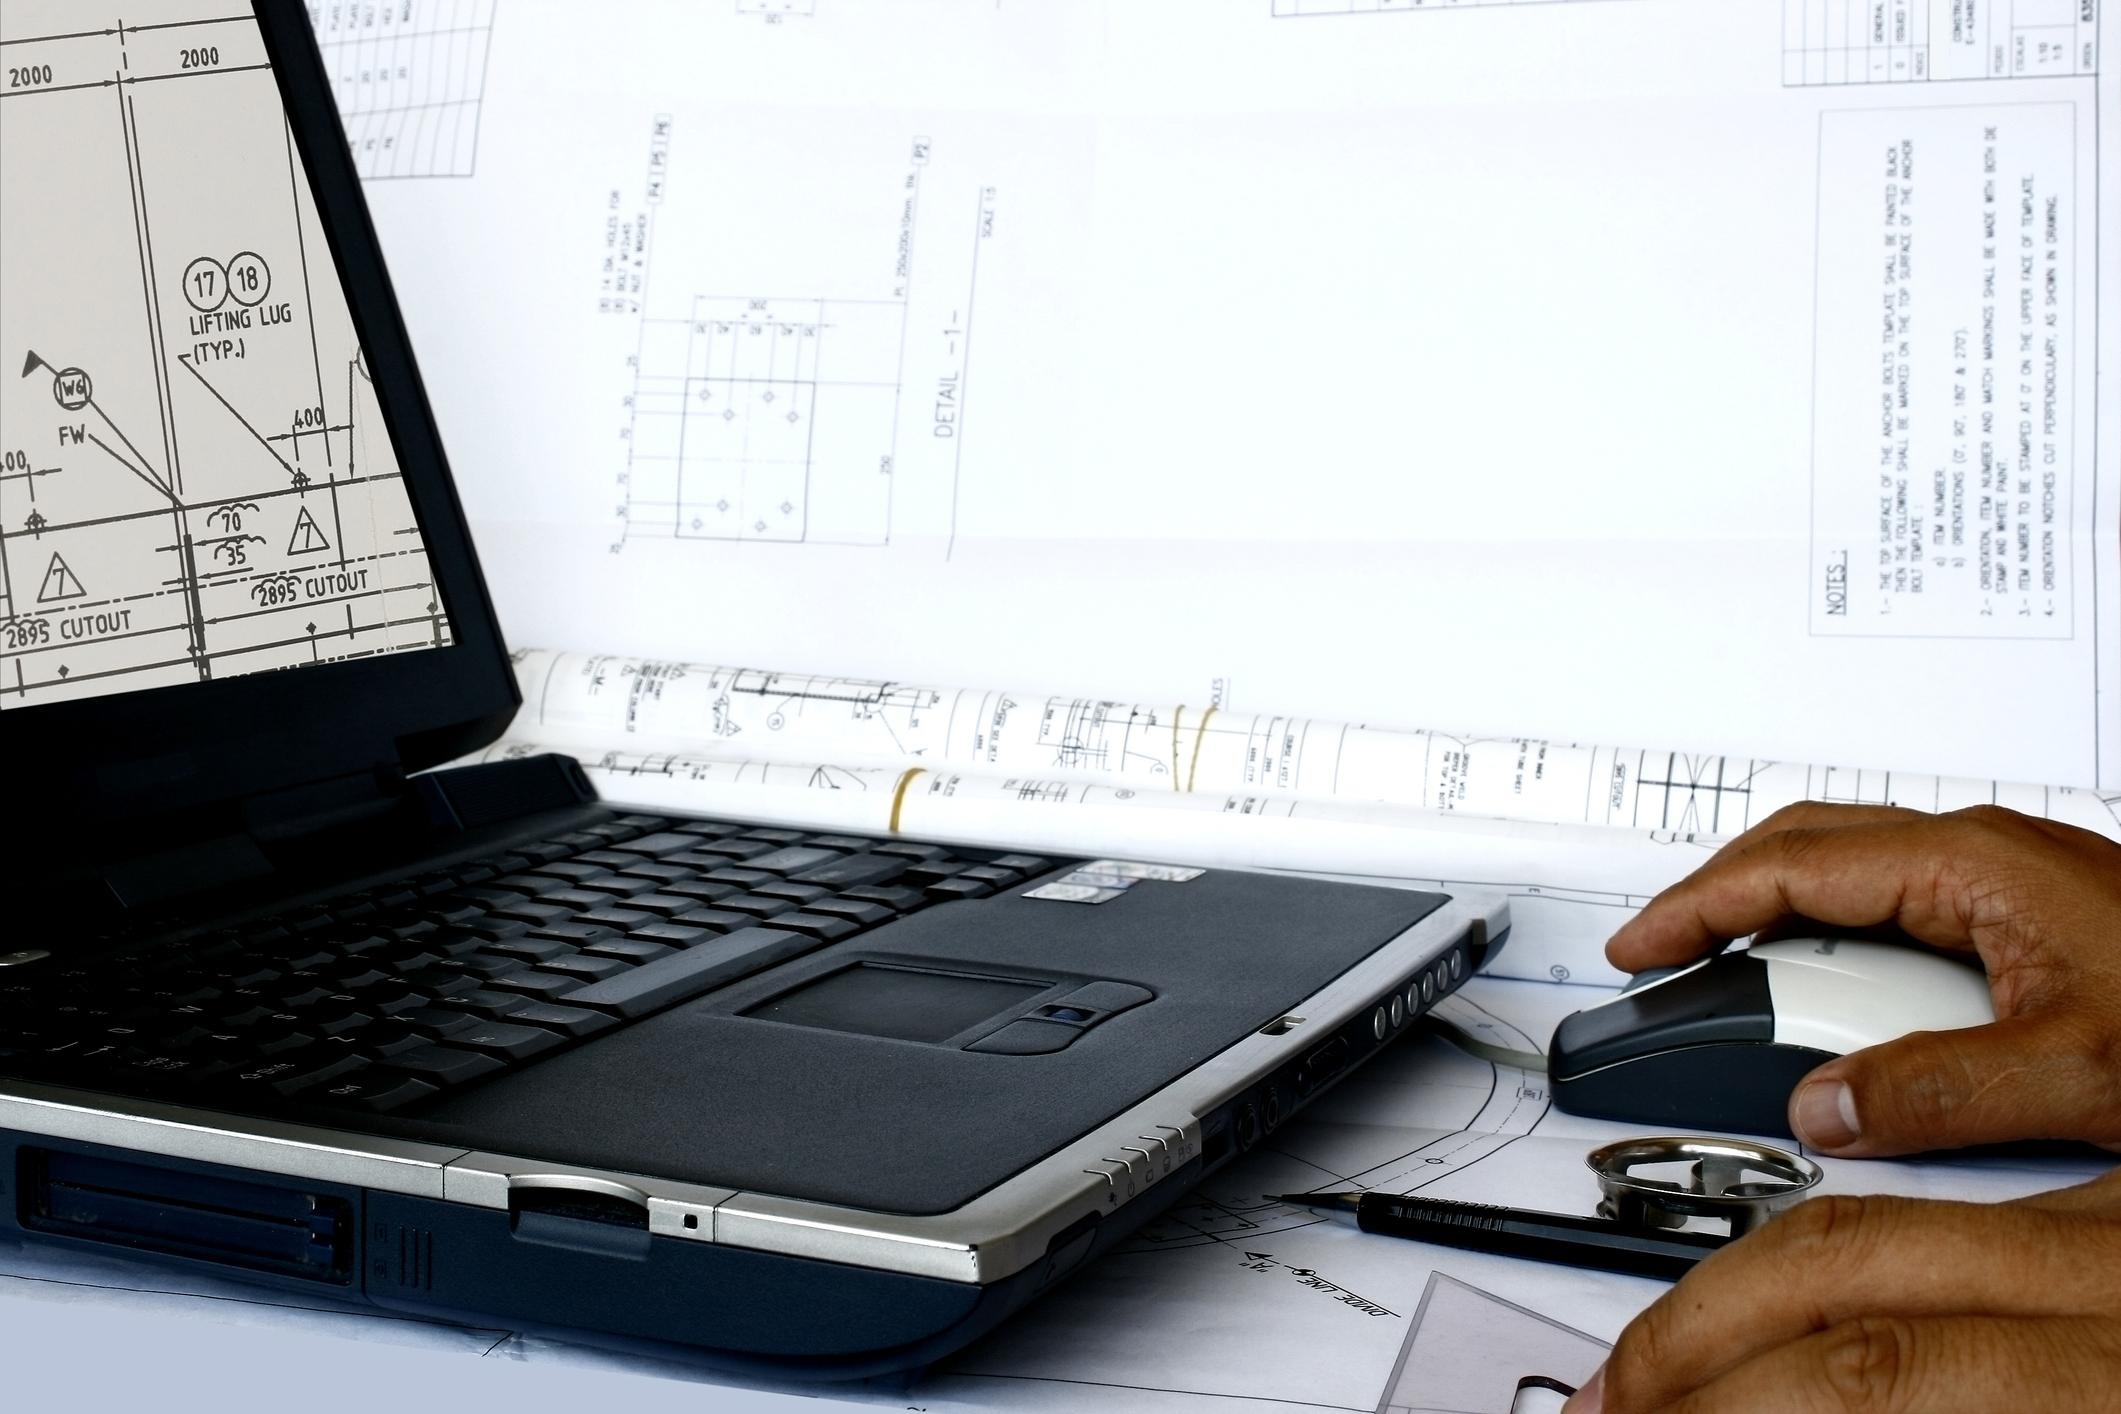 A user navigating a CAD program.